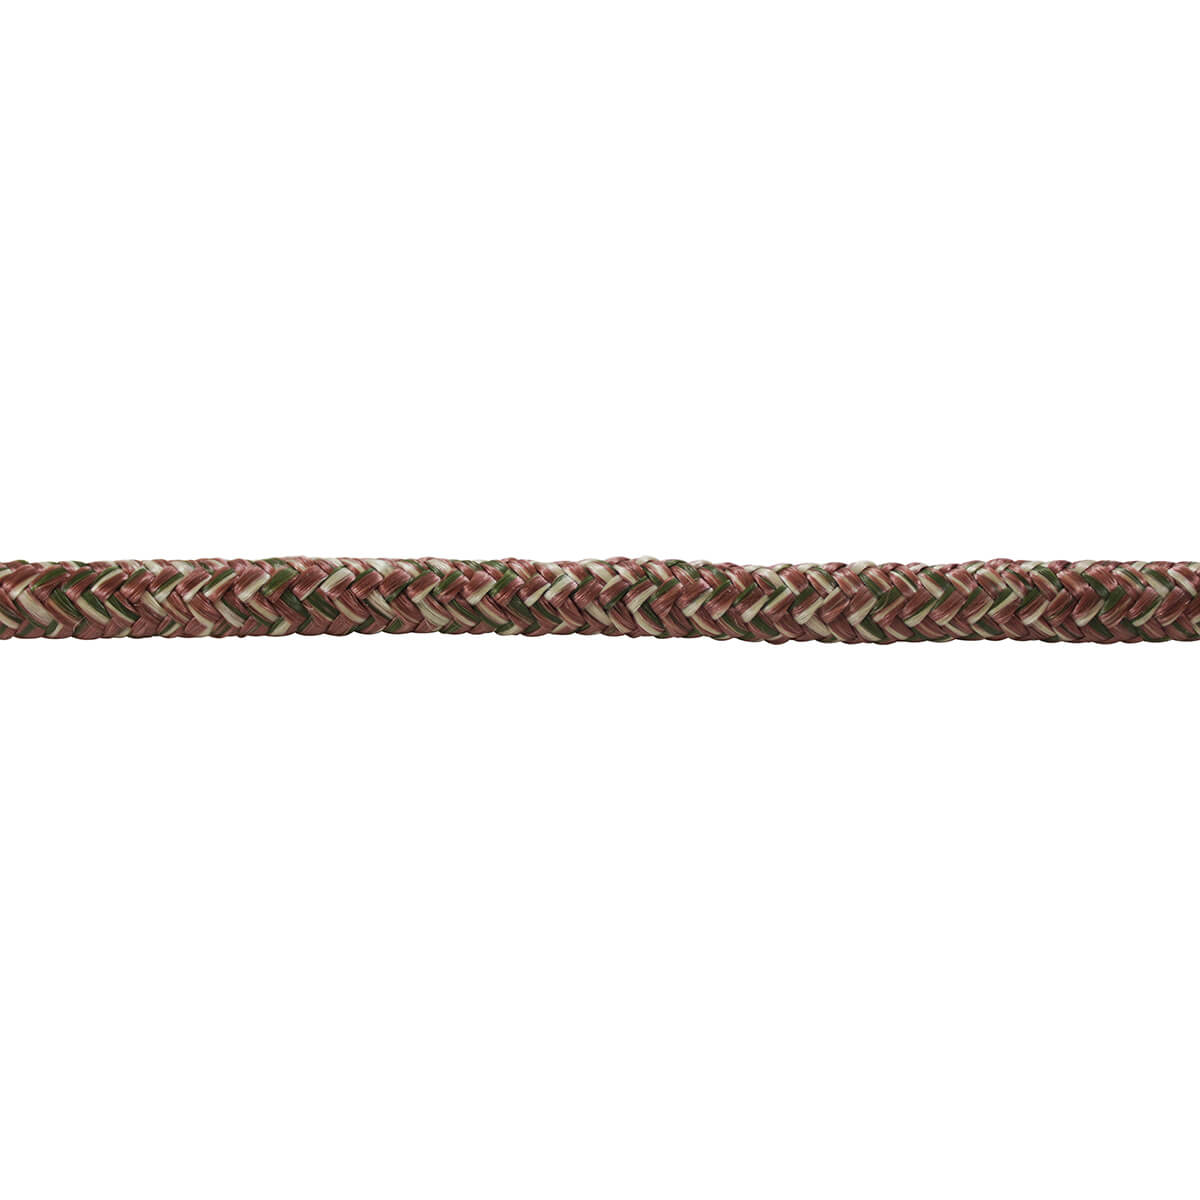 Polypropylene Diamond Braid Rope - Camoflauge - 3/8-in x 100-ft